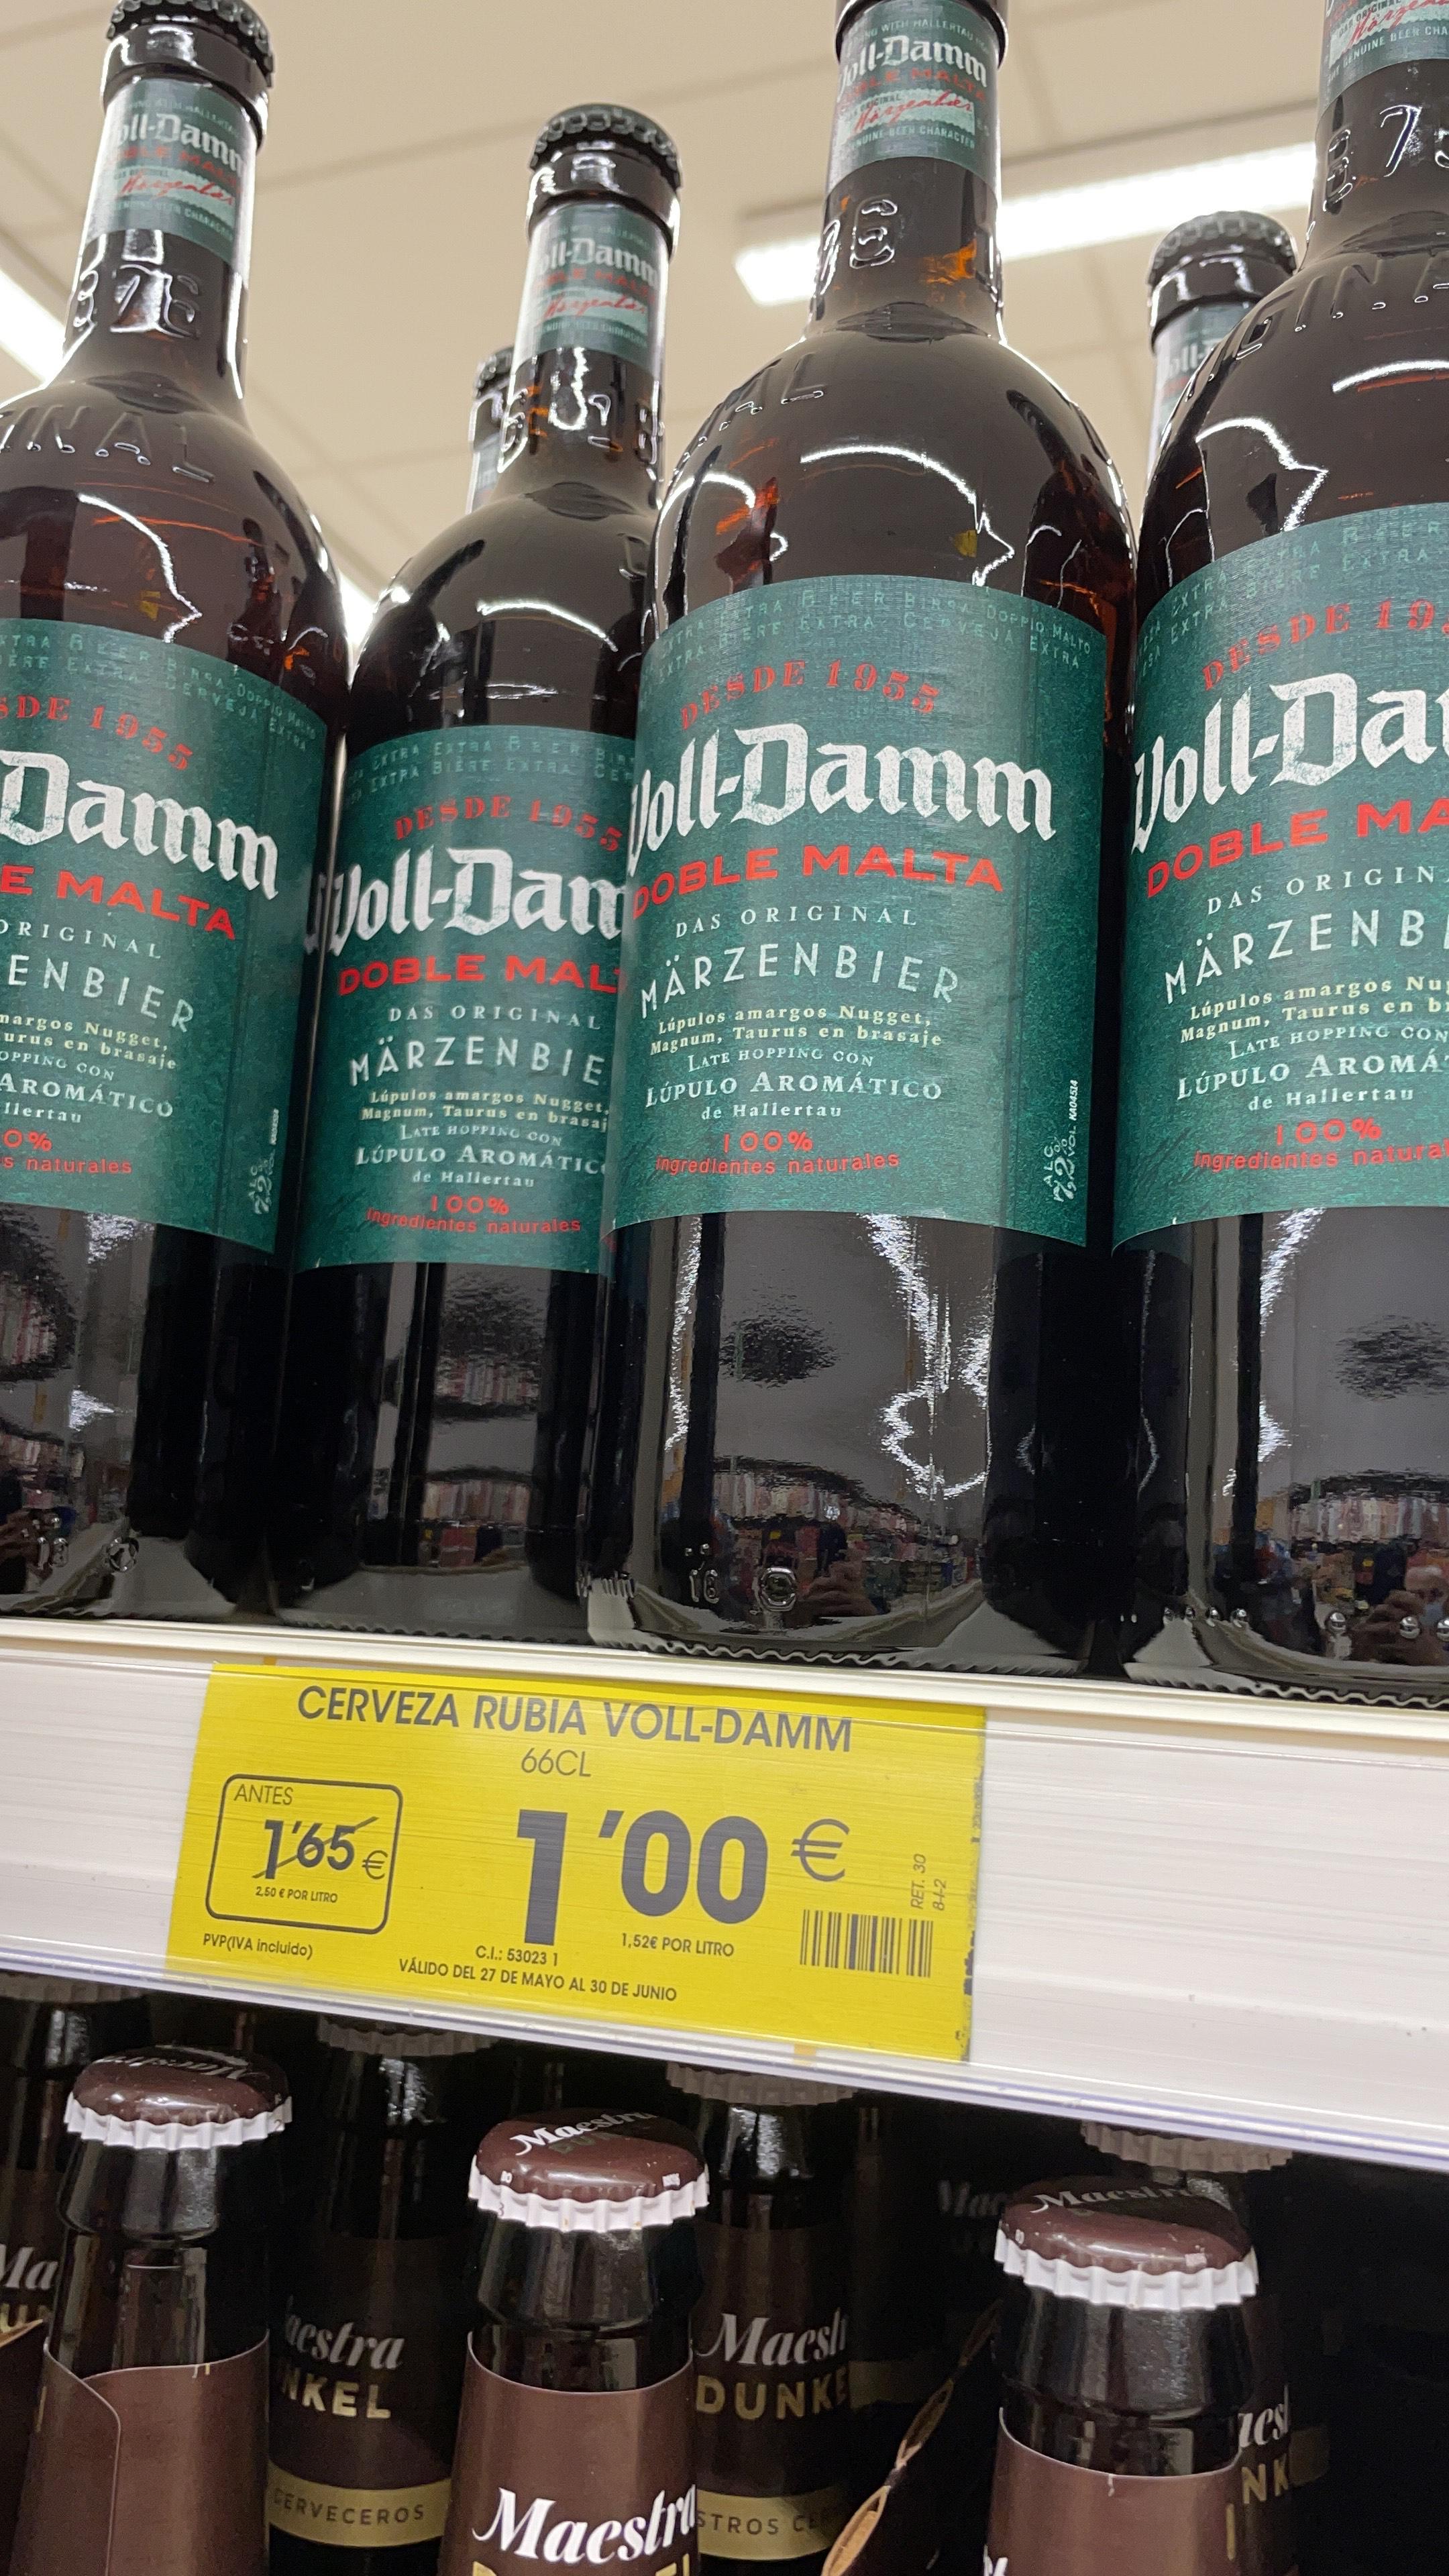 Cerveza Voll-Damm 66Cl SUPERMERCADOS AHORRAMAS